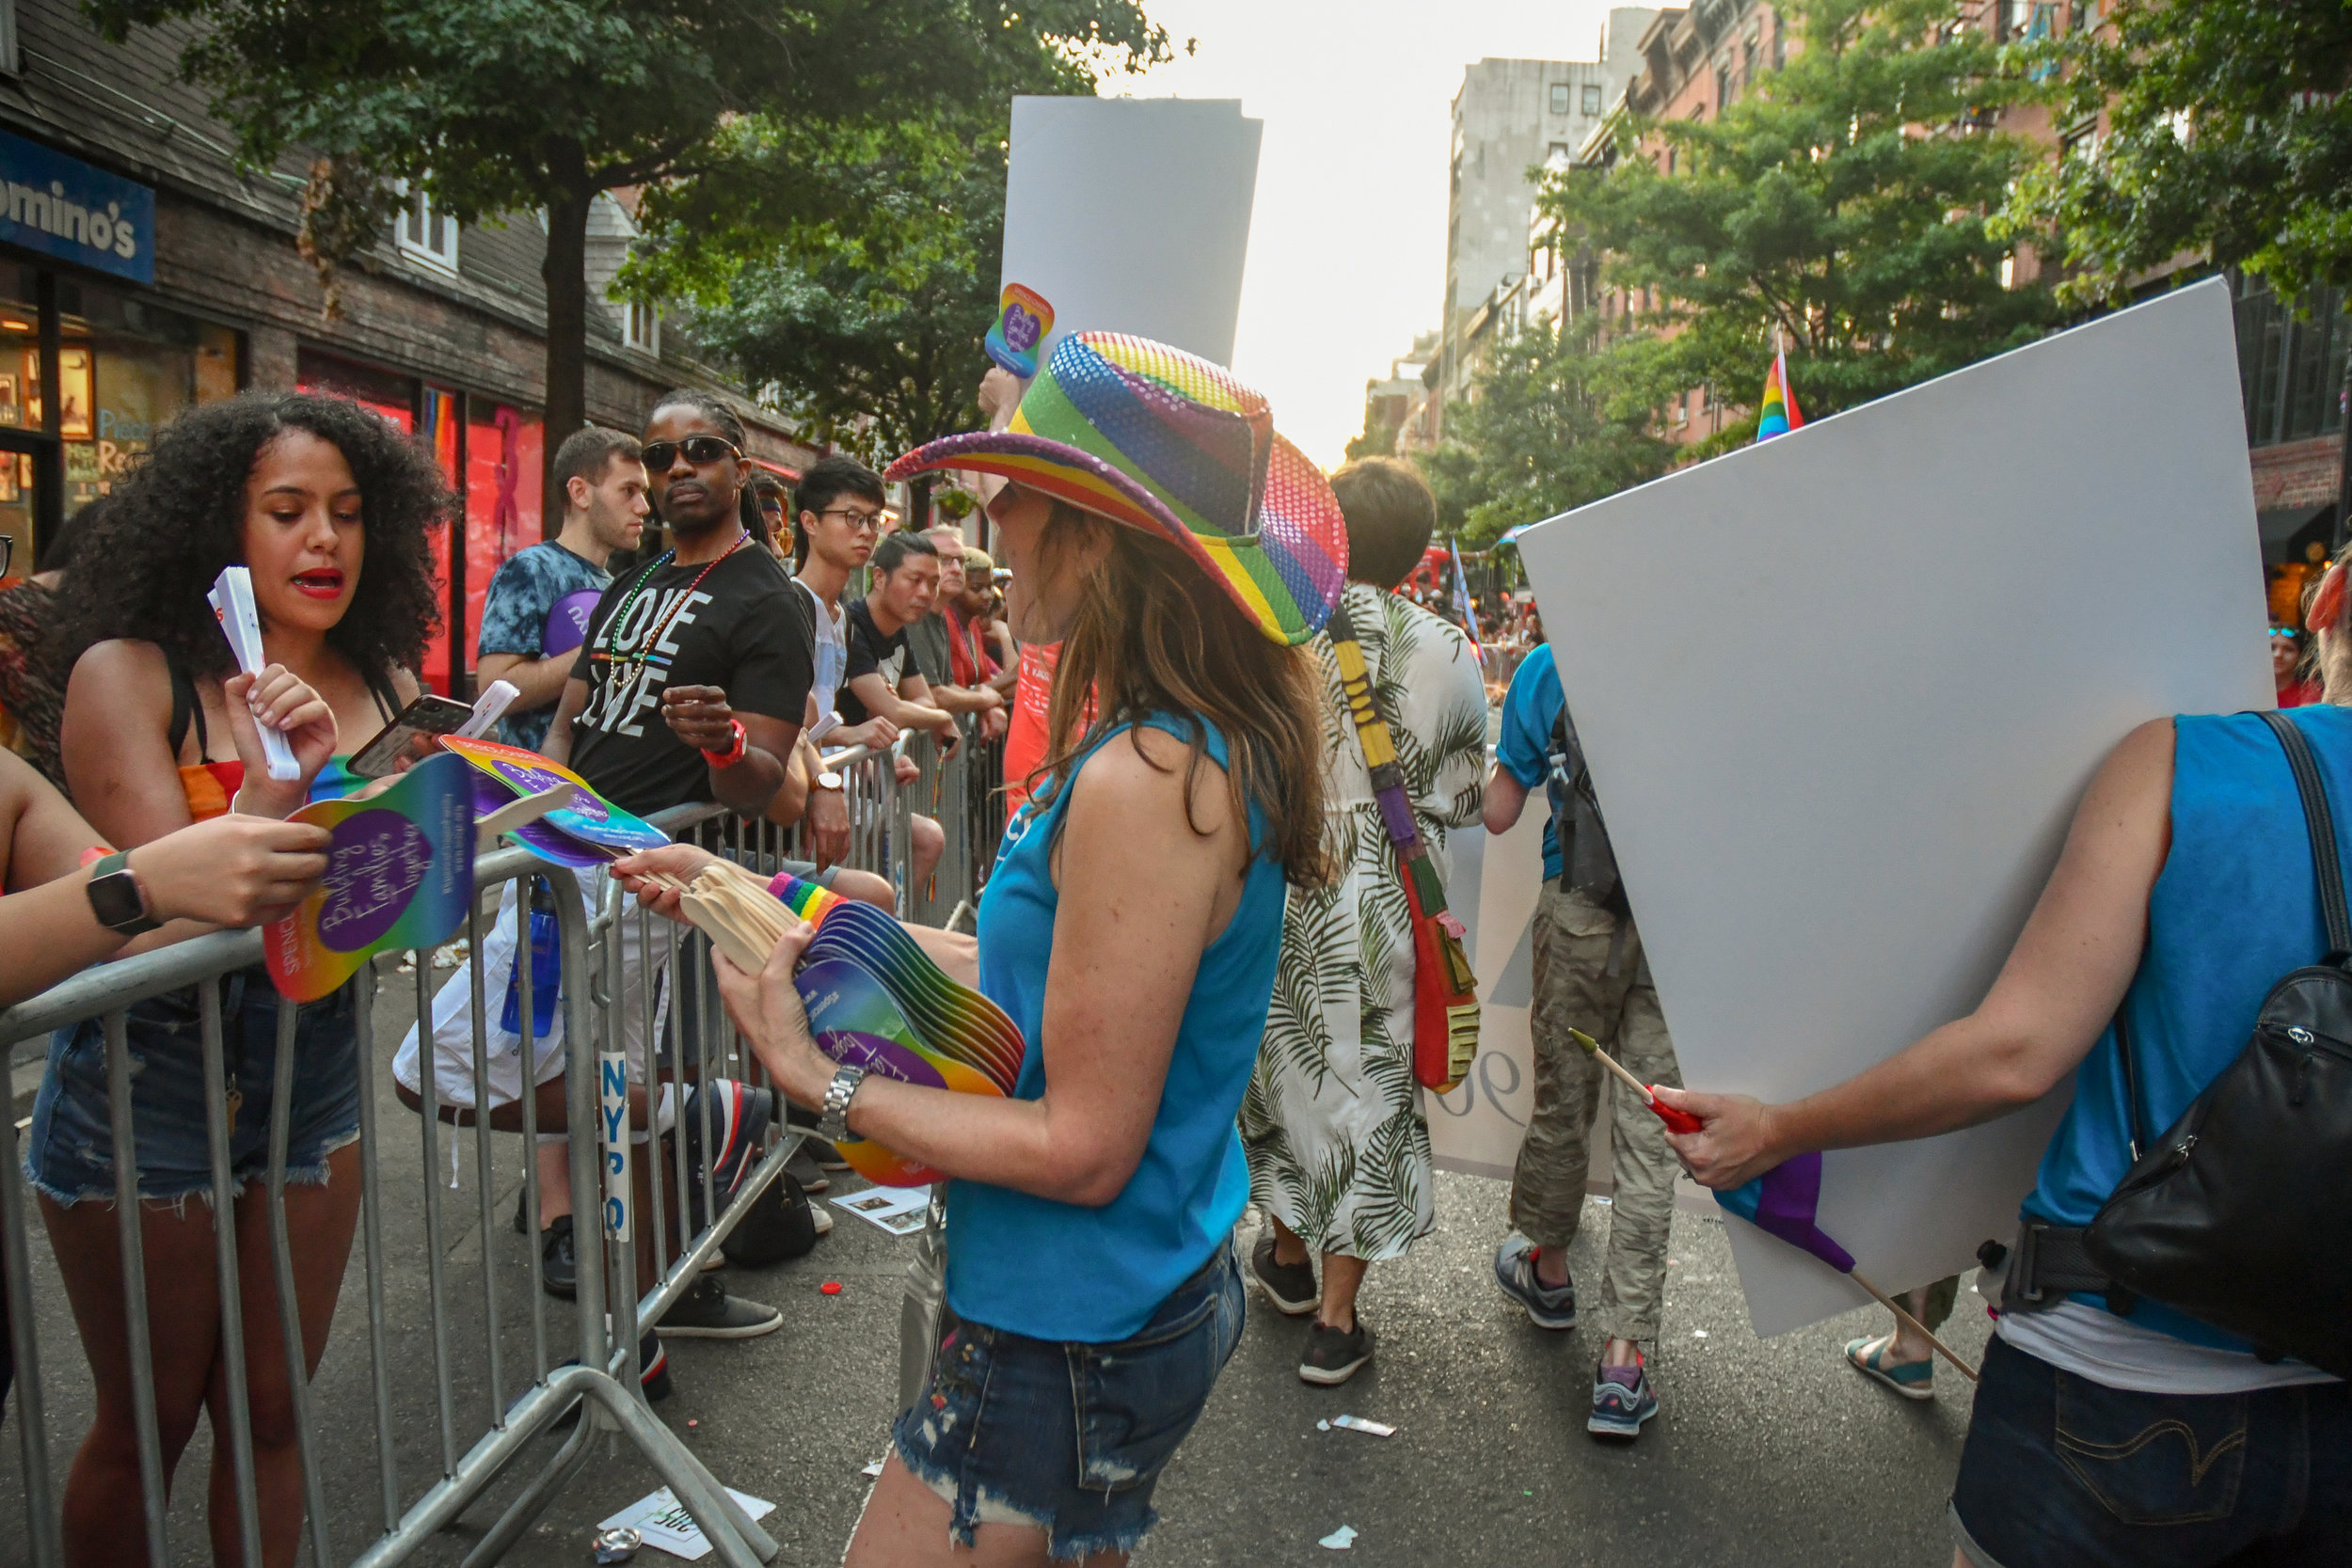 SC-PrideParade-2019_FE-274.jpg